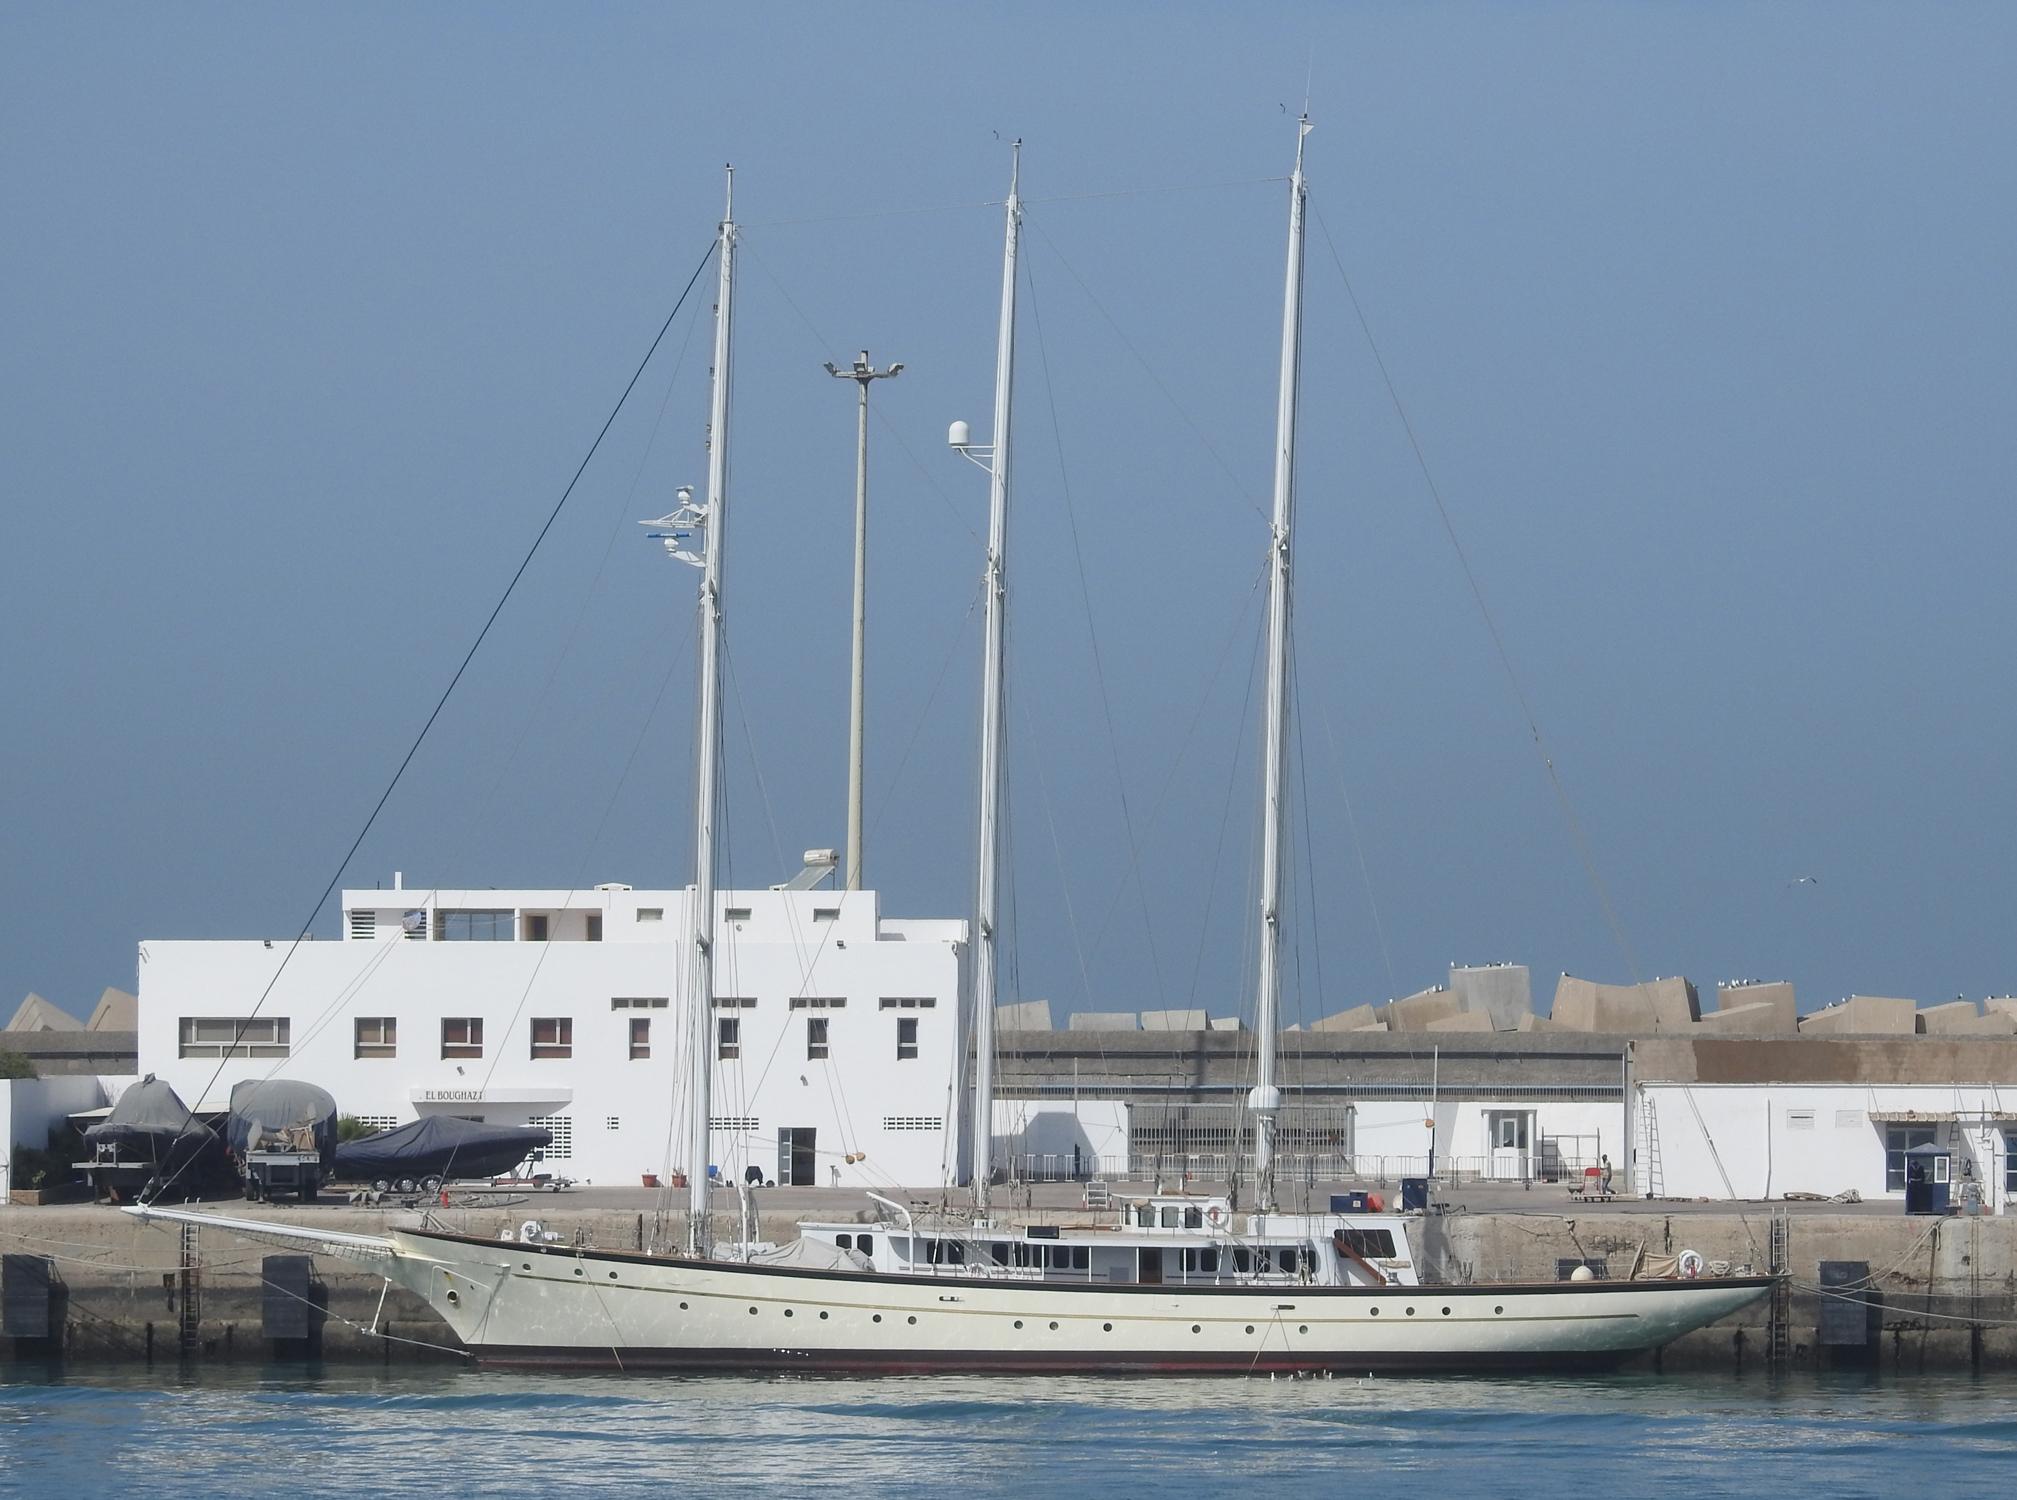 la flotte des Yachts Royals : El Boughaz I - Badis 1 - Page 2 3006087